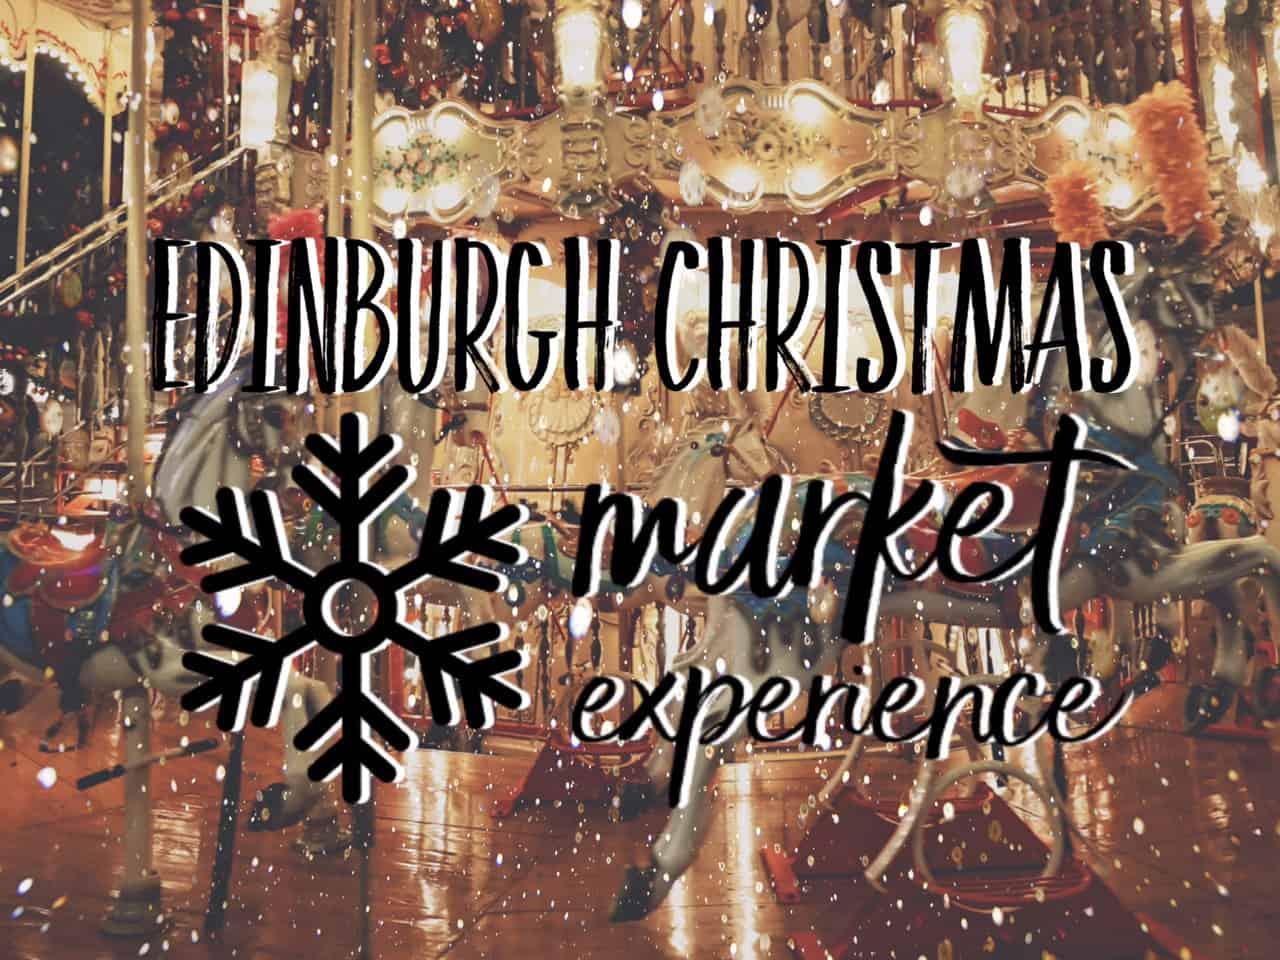 Visiting Edinburgh Christmas Market